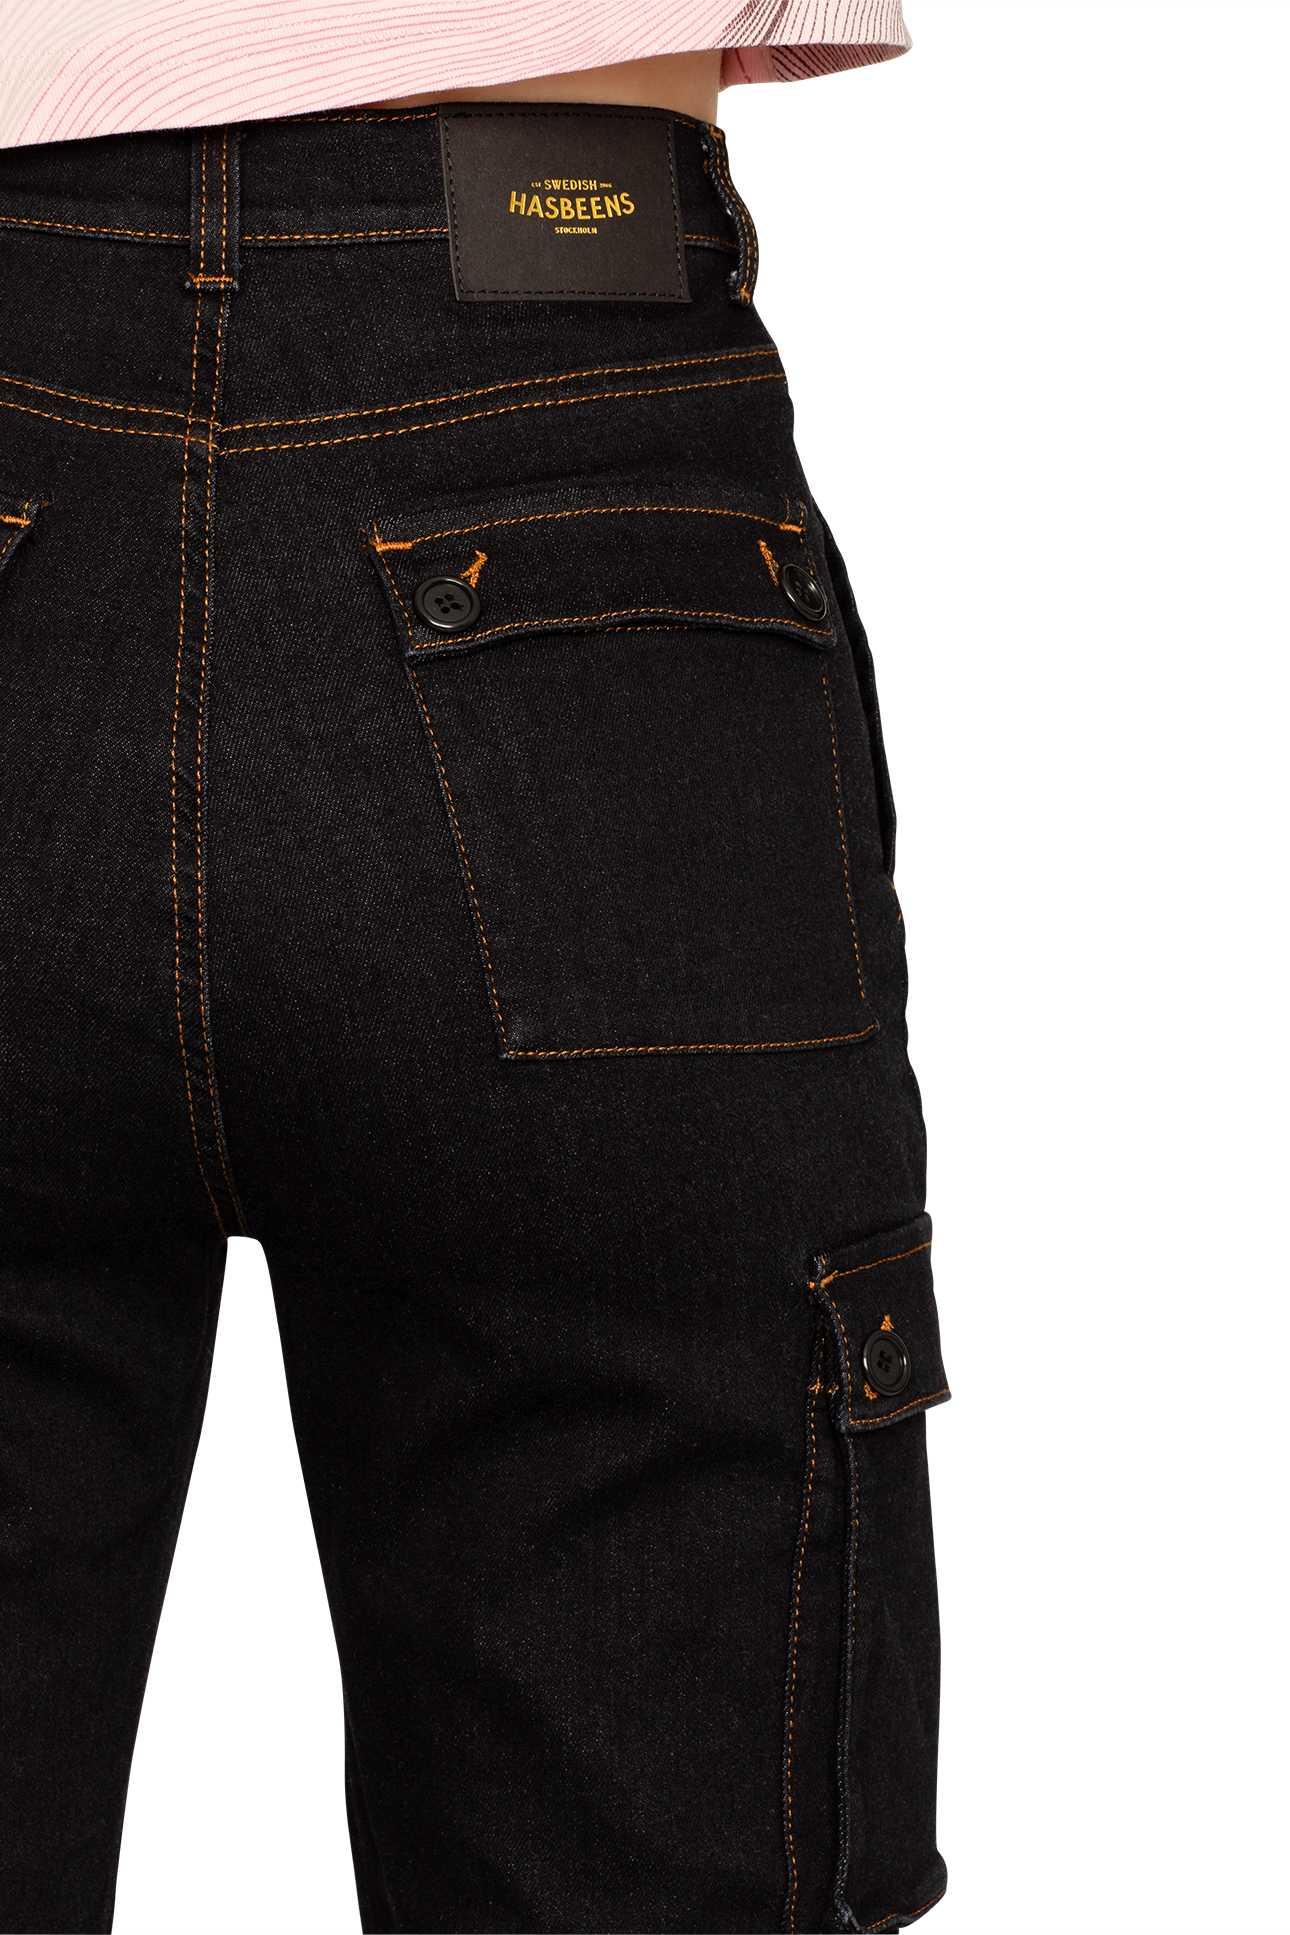 Product image Cargo Pant Denim